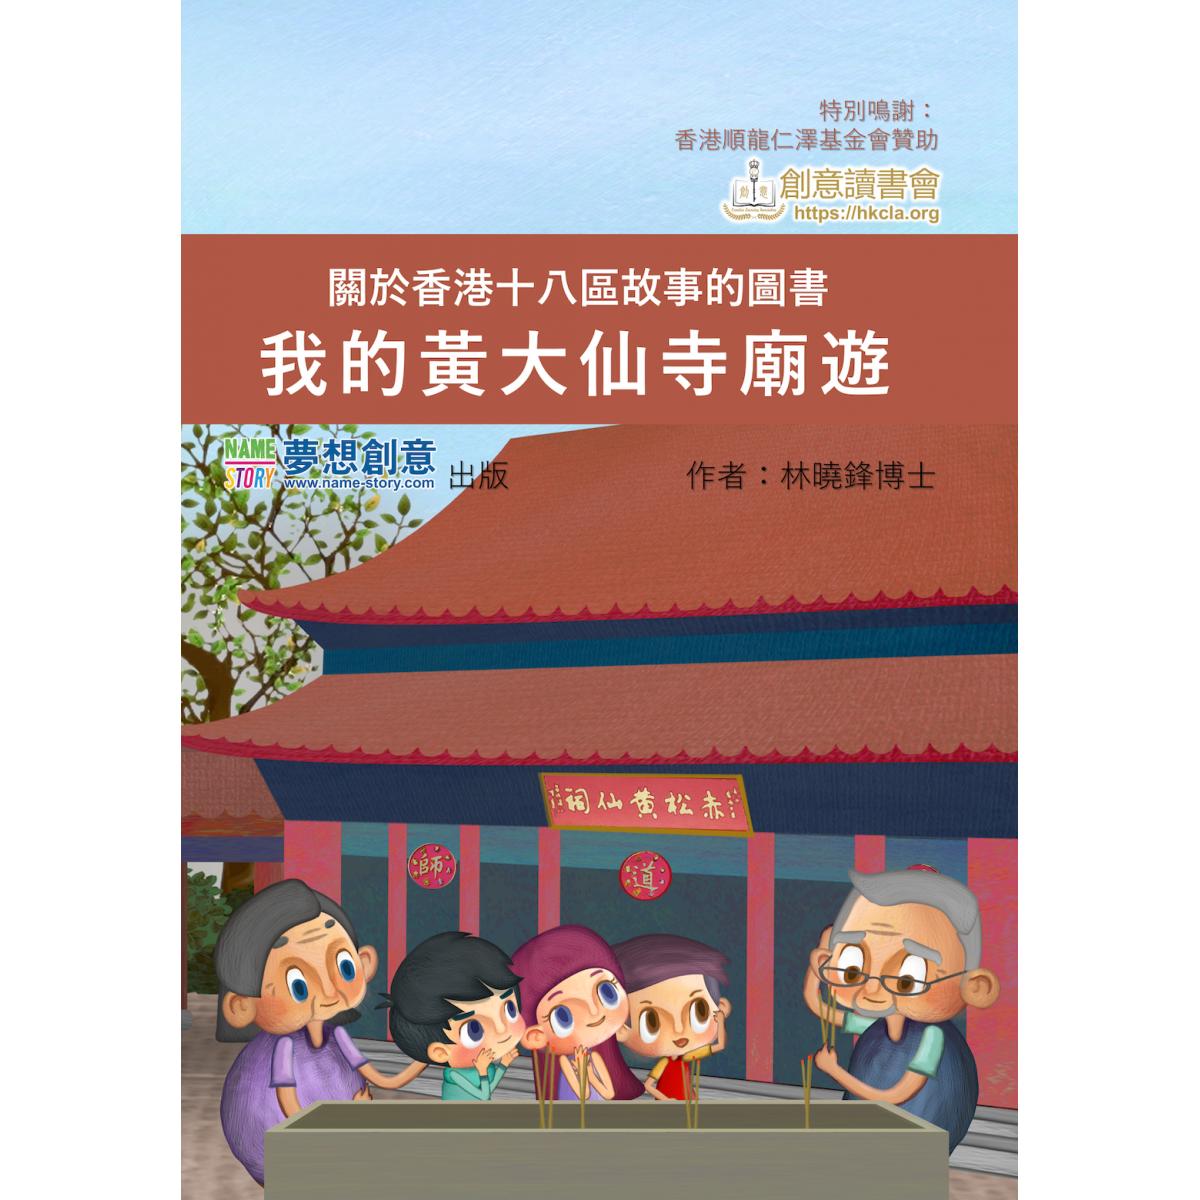 MHKS10-我的黃大仙寺廟遊